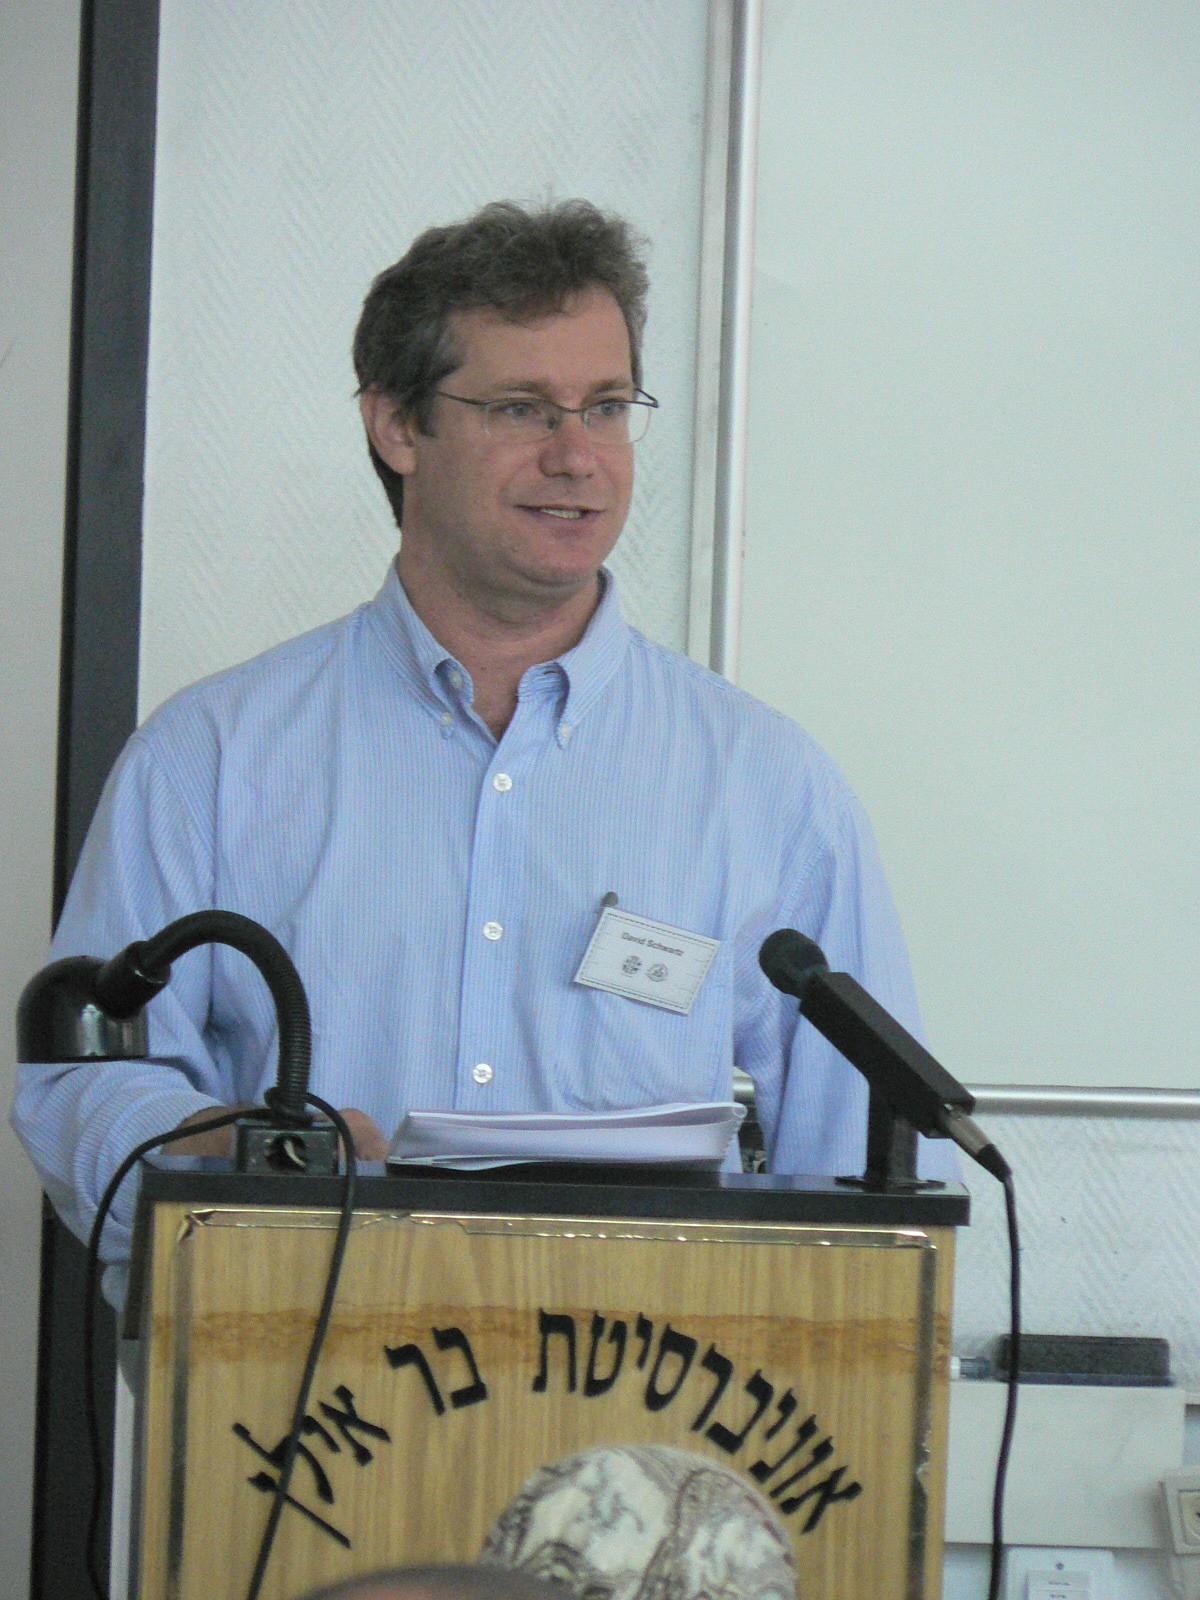 David Schwartz - ILAIS2007